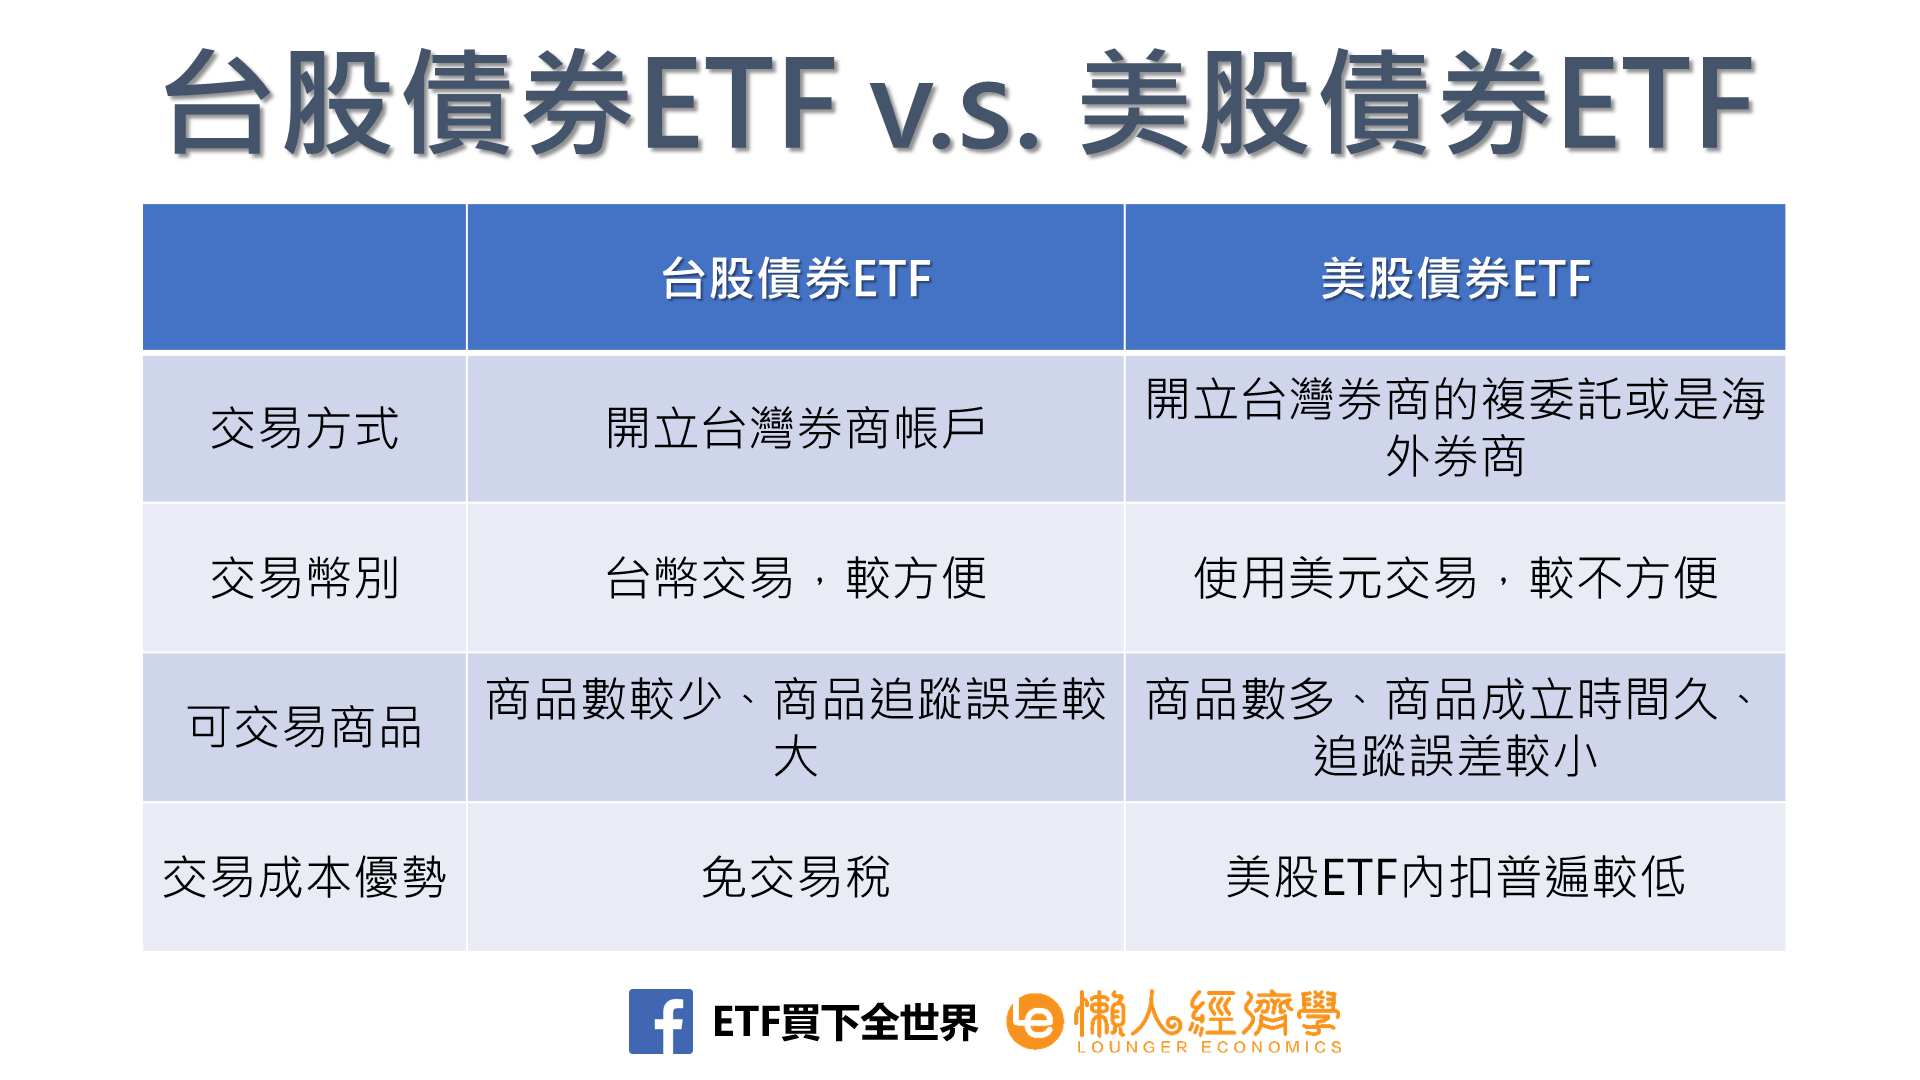 台股債券ETF v.s. 美股債券ETF